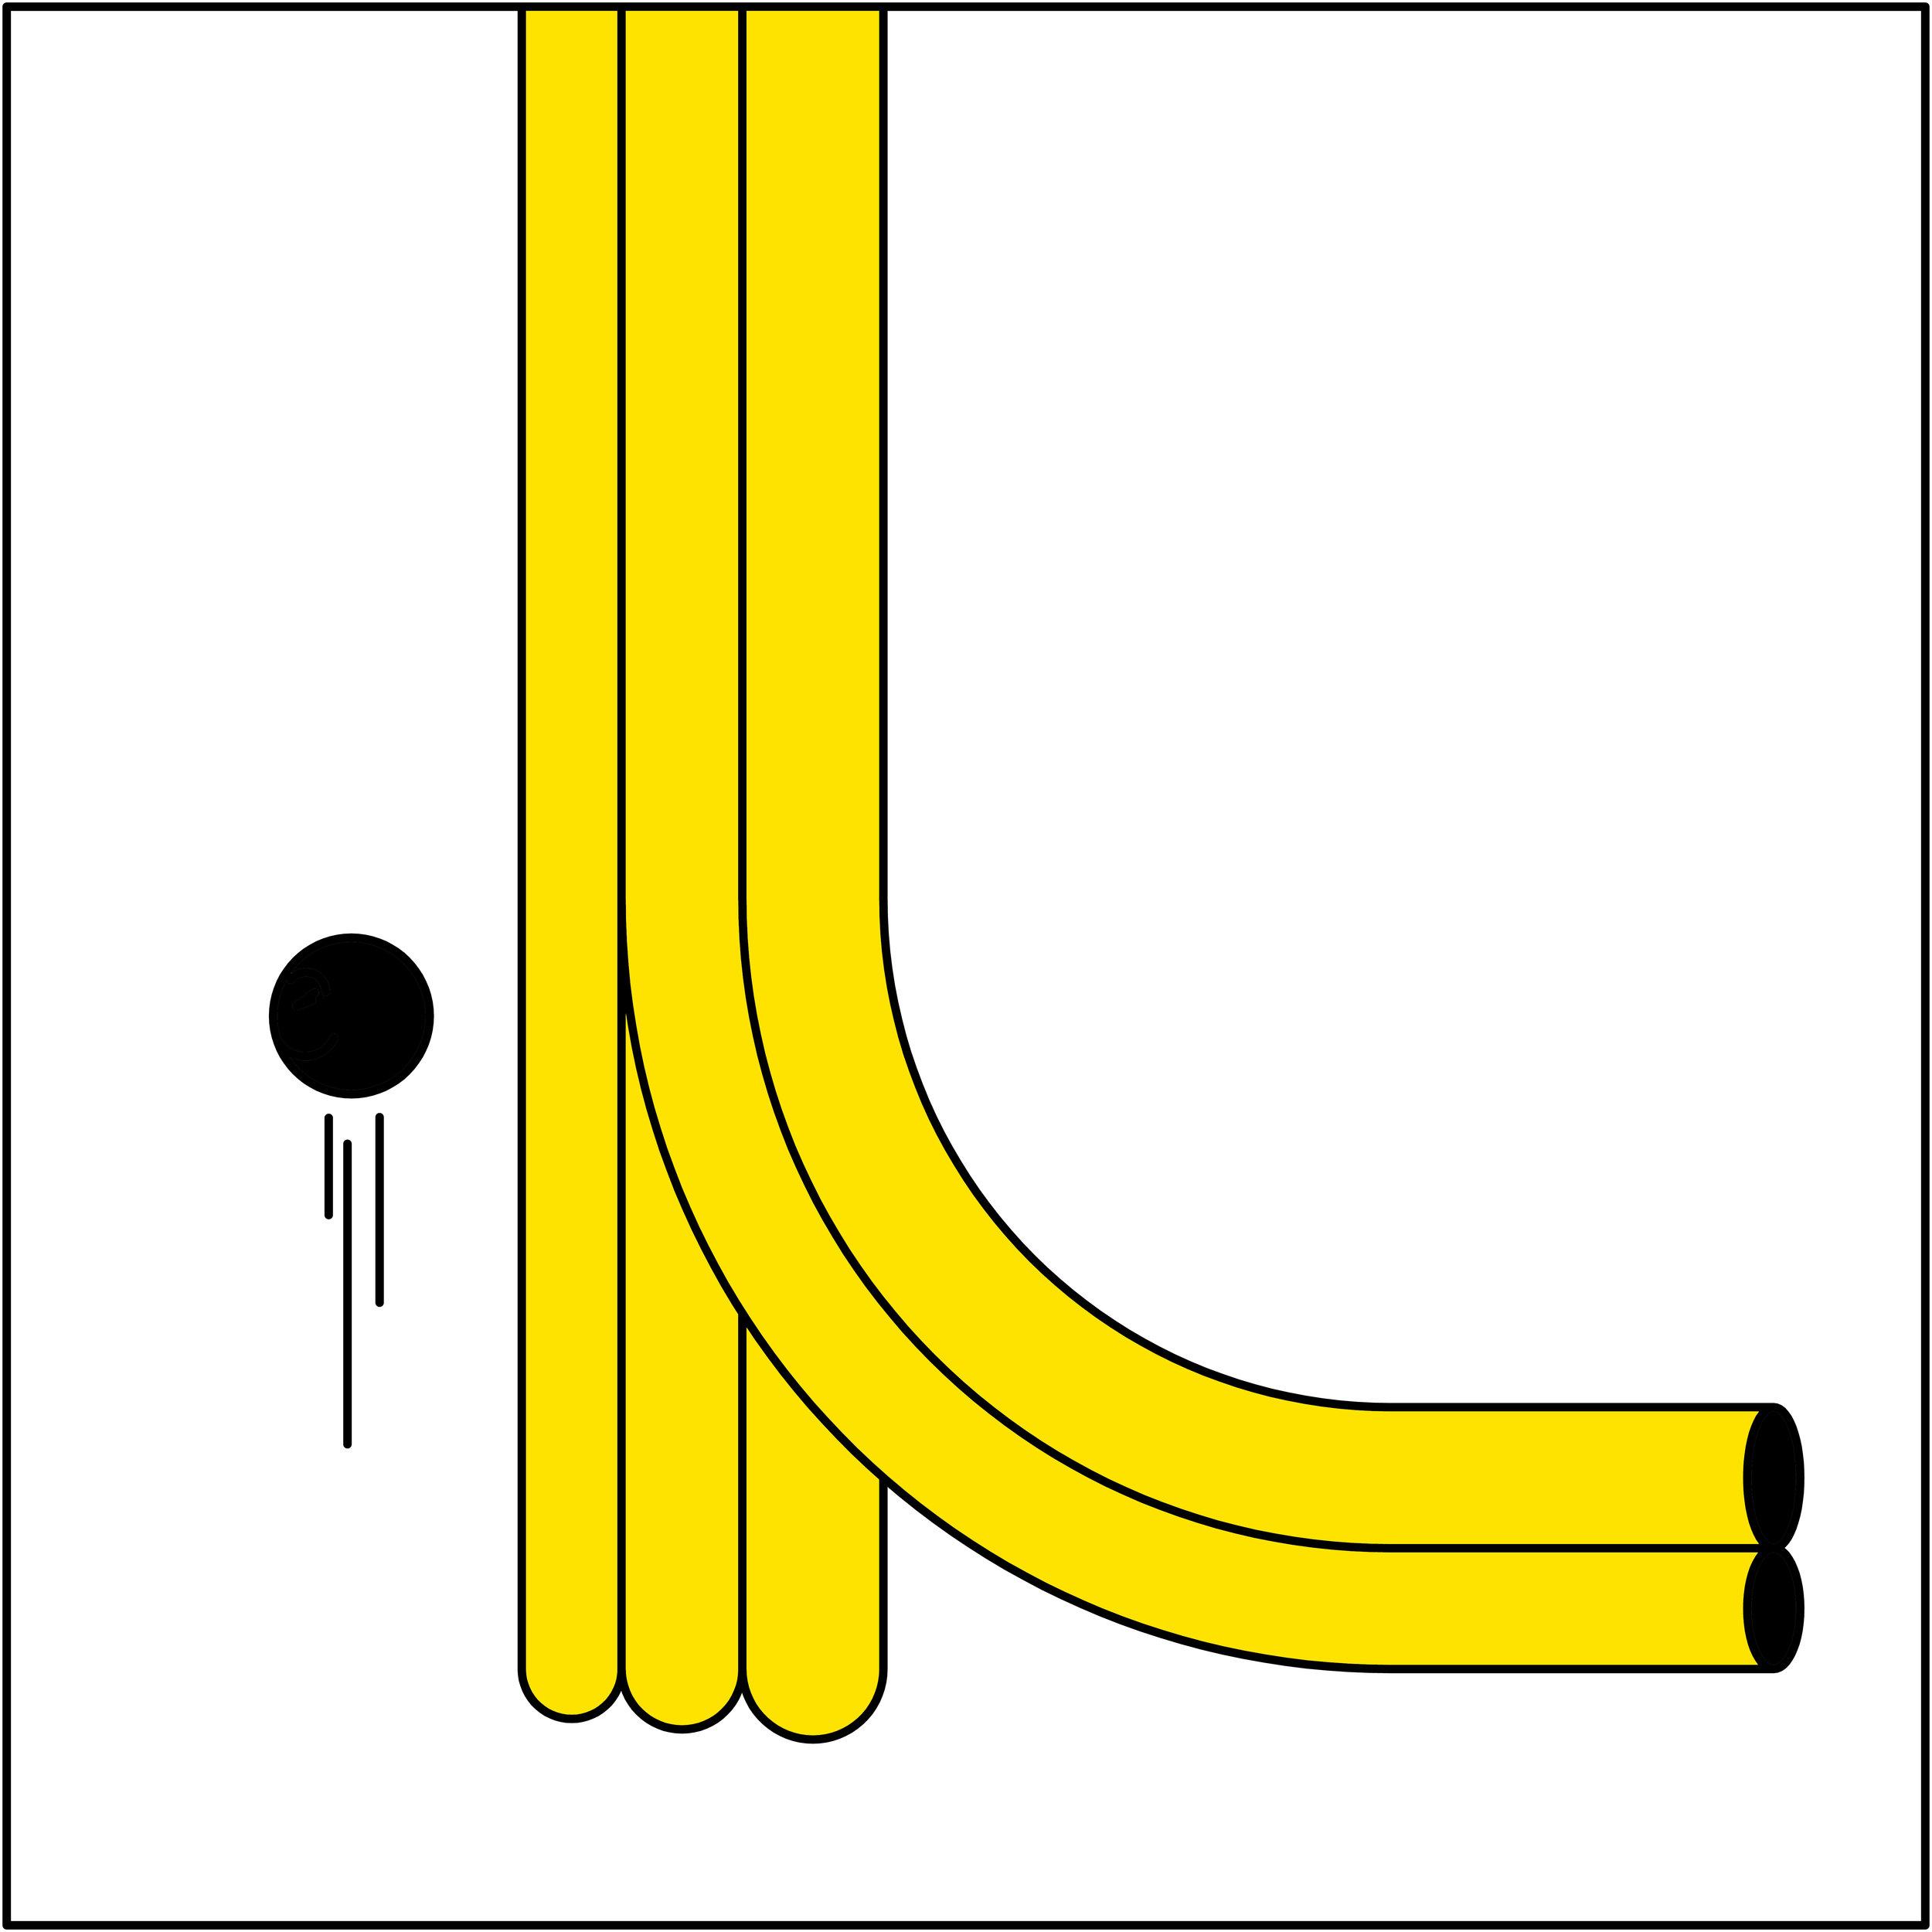 spaghetti yellow - 006.jpg